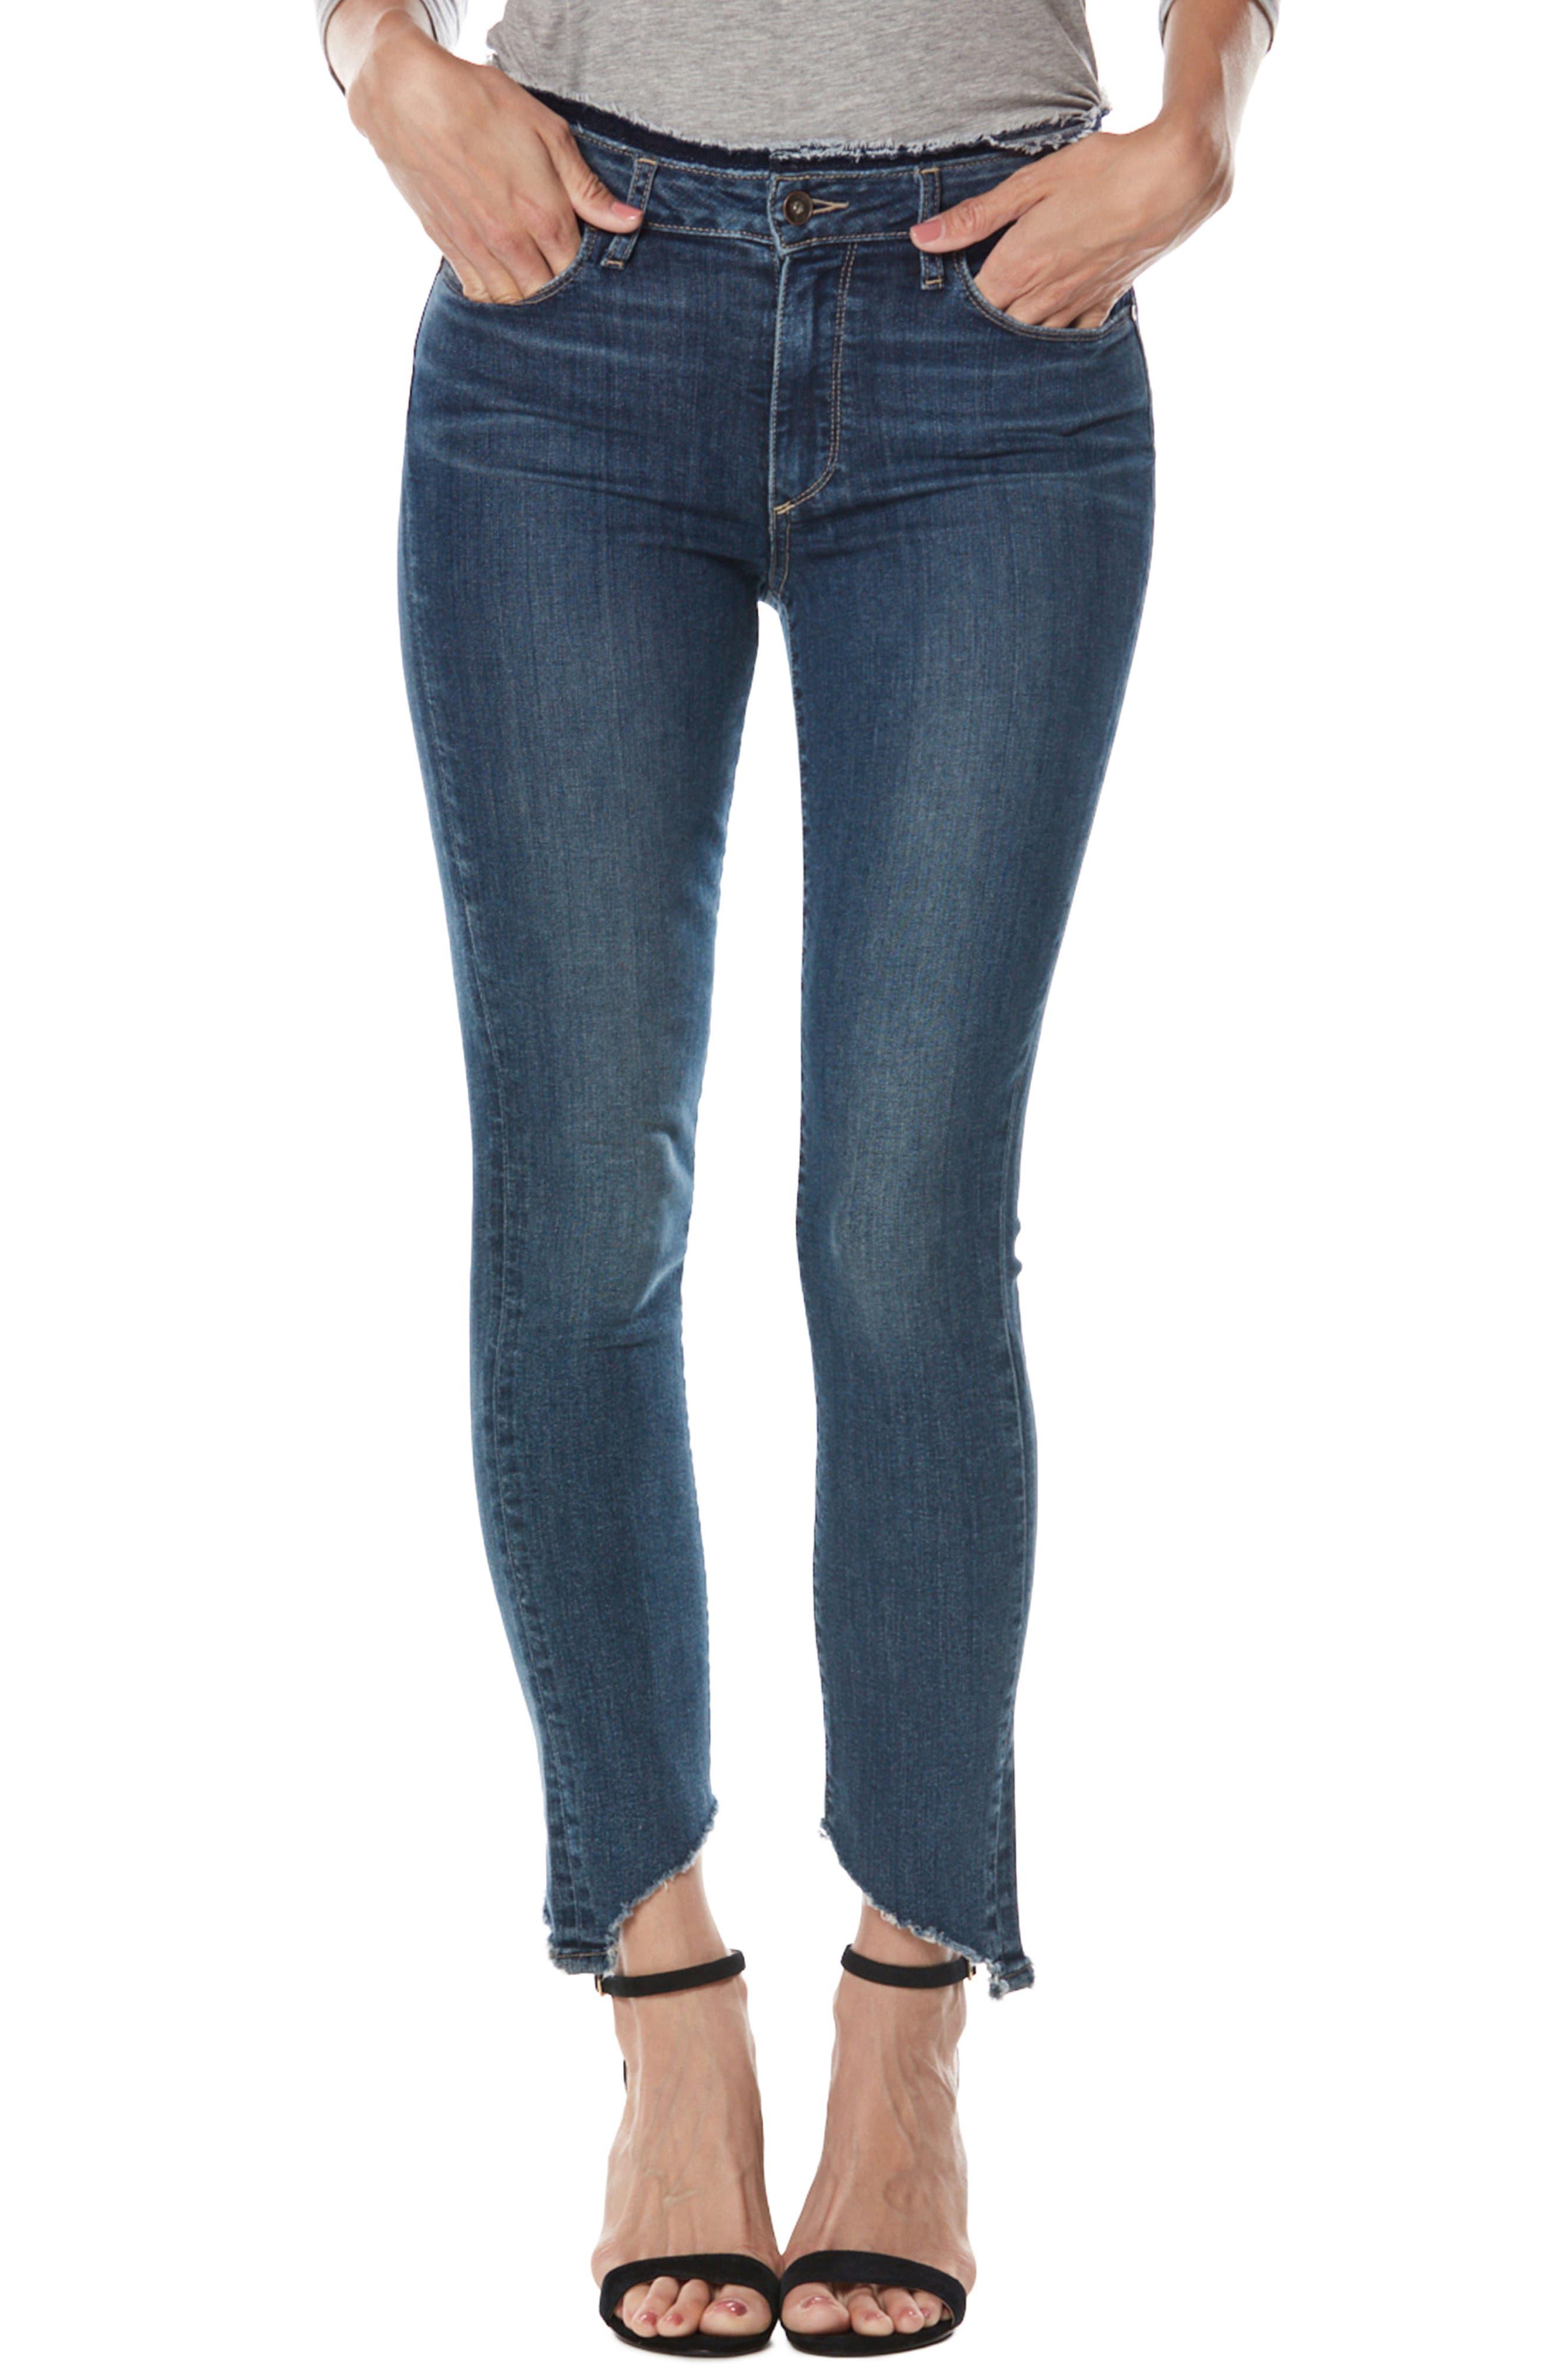 Main Image - PAIGE Hoxton High Waist Frayed Hem Ankle Skinny Jeans (Fraya)